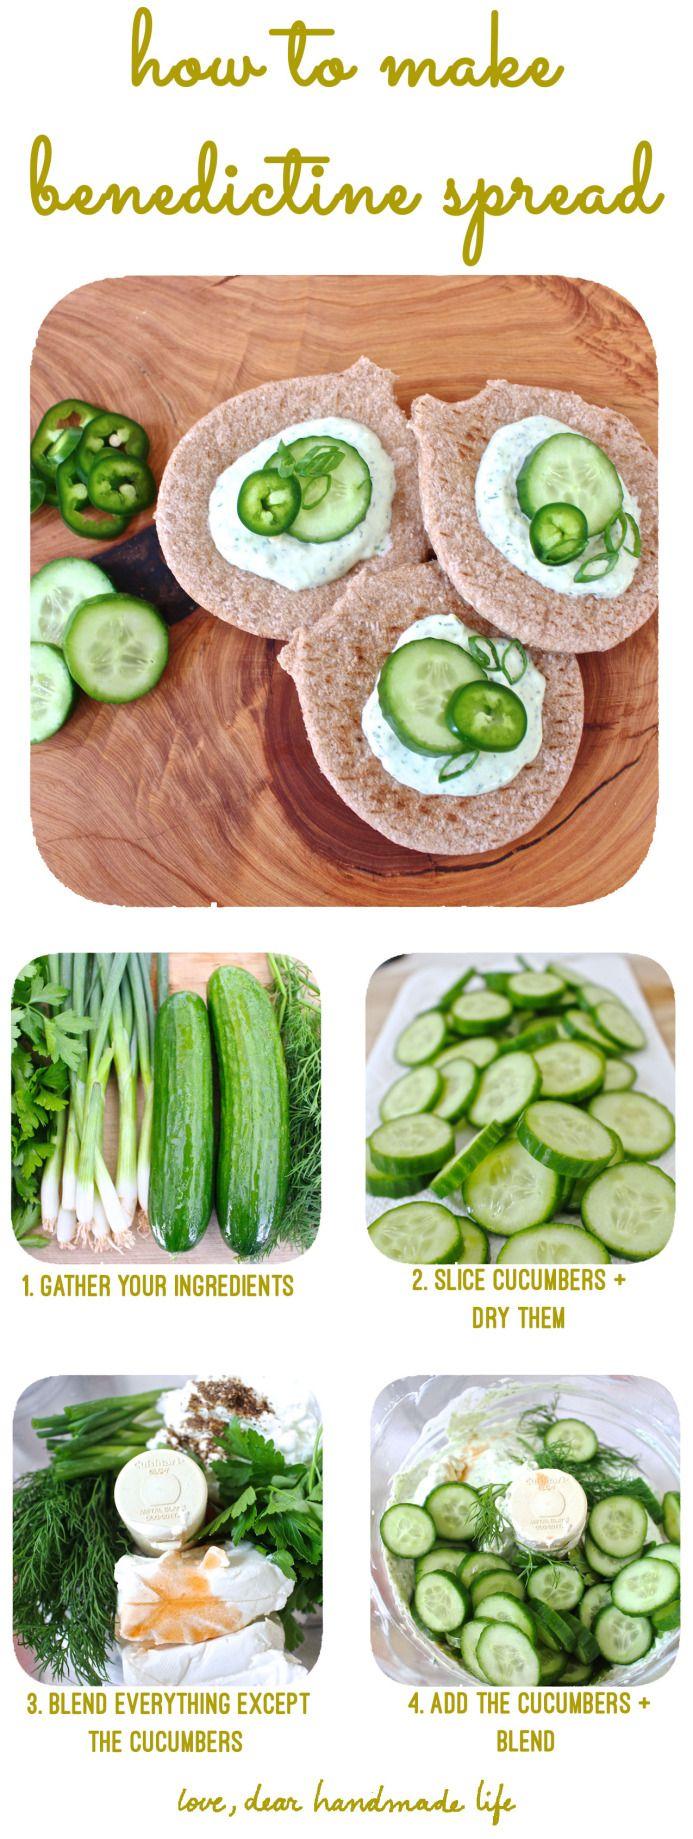 3-how-to-make-benedictine-spread-cucumber-dill-greek-yogurt-cream-cheese